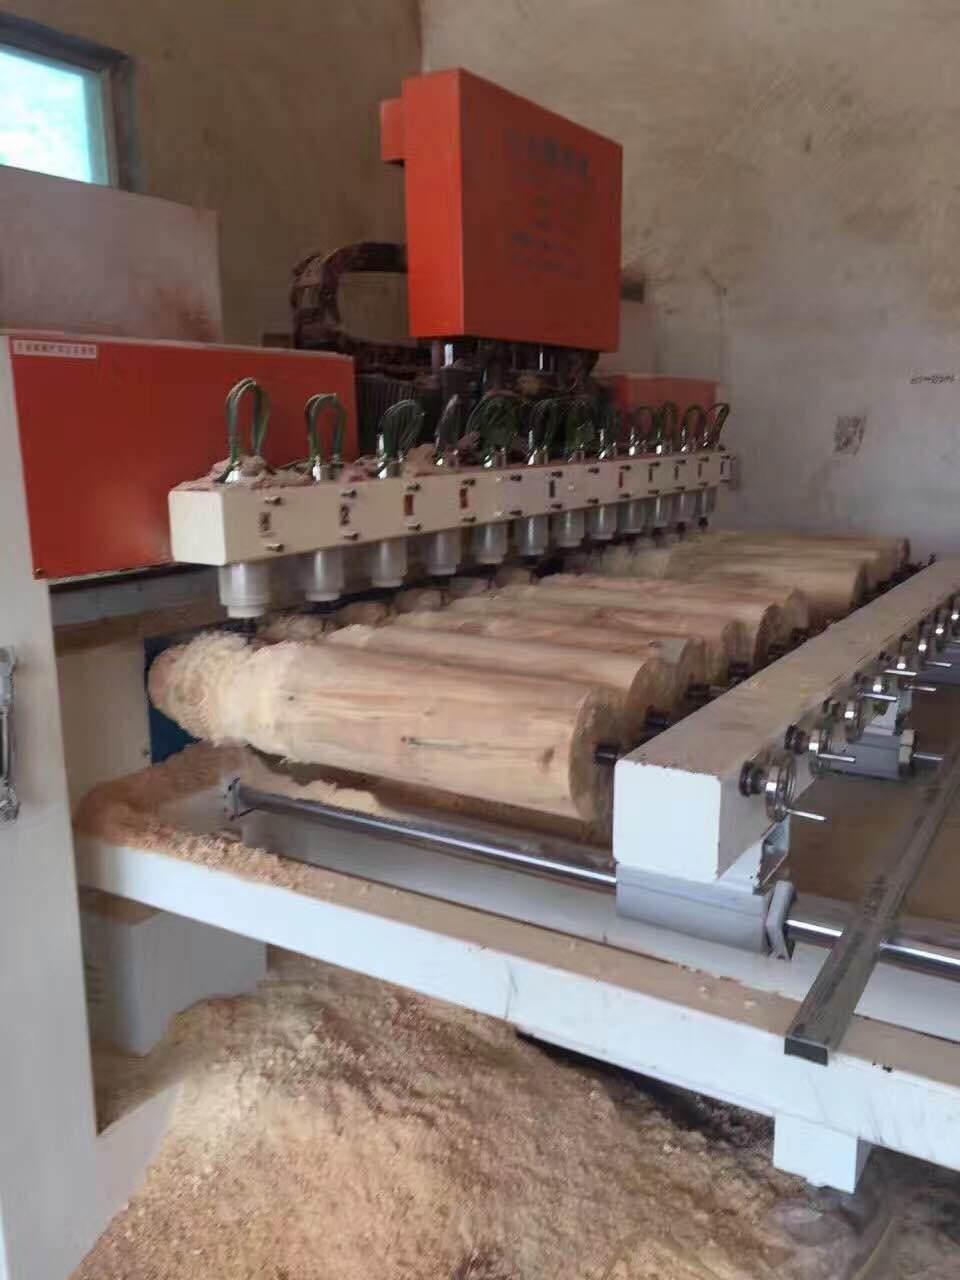 hongfa 4 axis wood engraving machine cnc wood carving mahcine